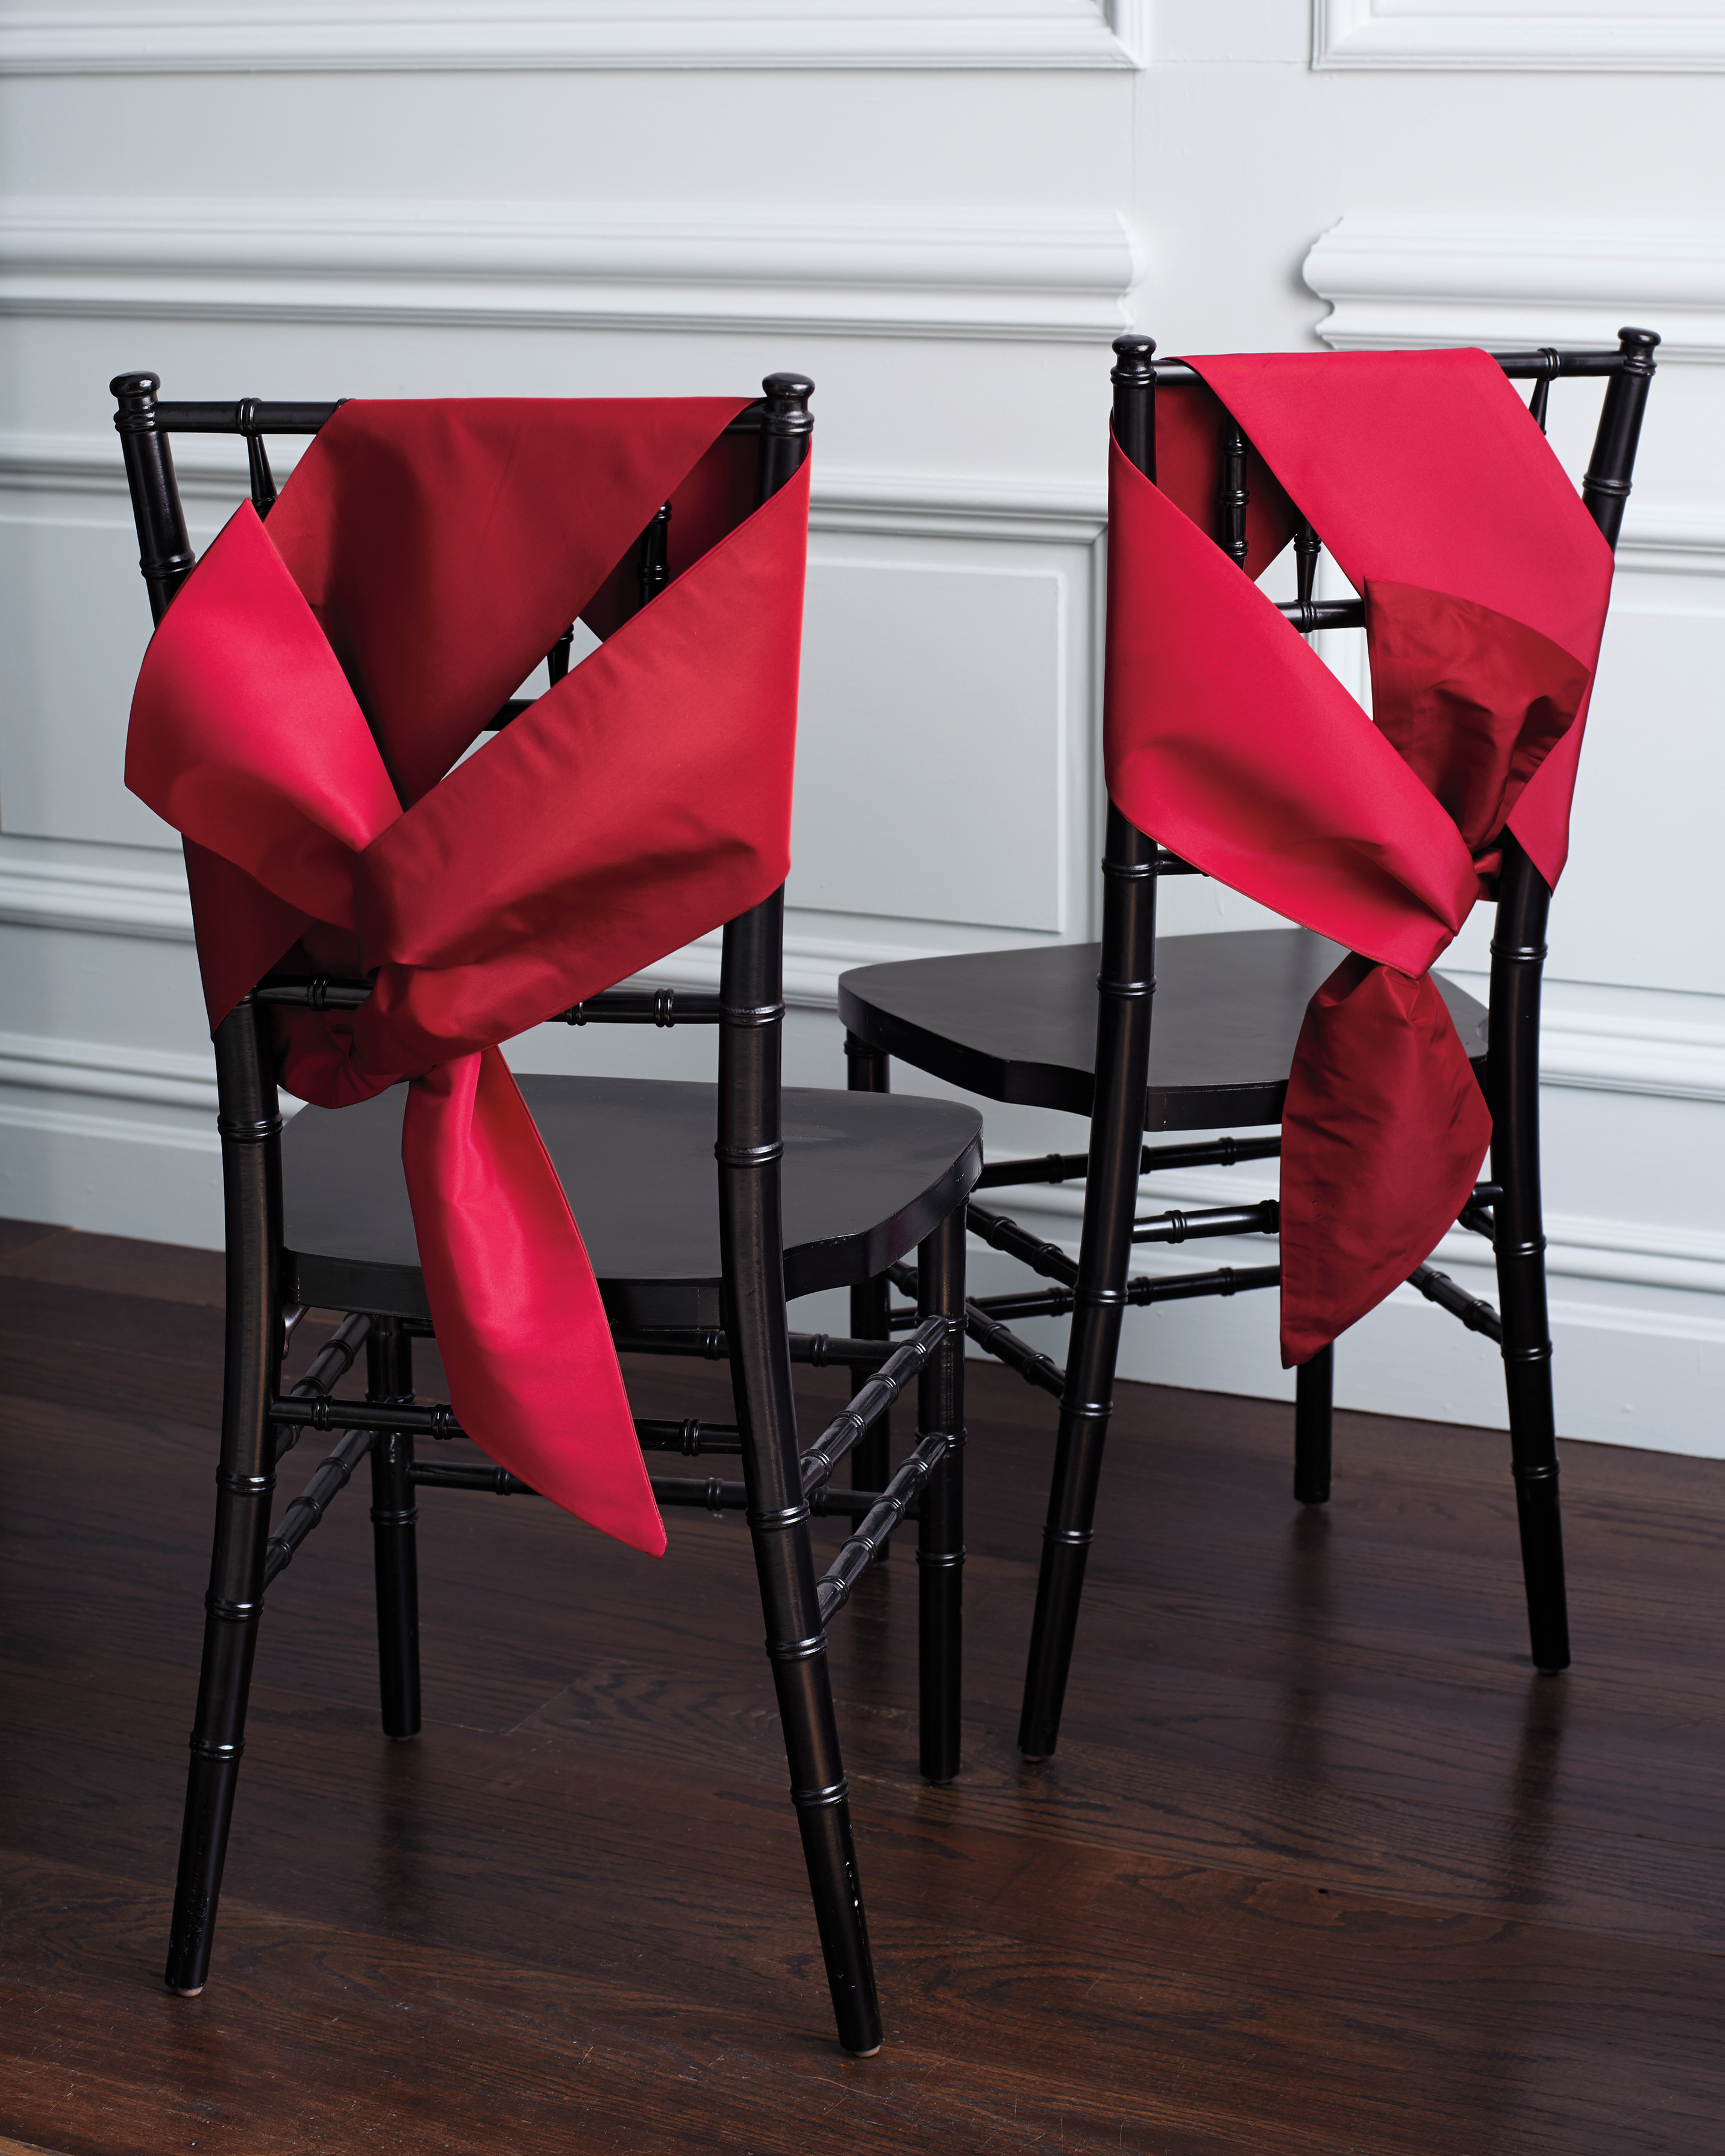 knots-chair-back-fabric-knot-0296-under-exposure-d112254.jpg